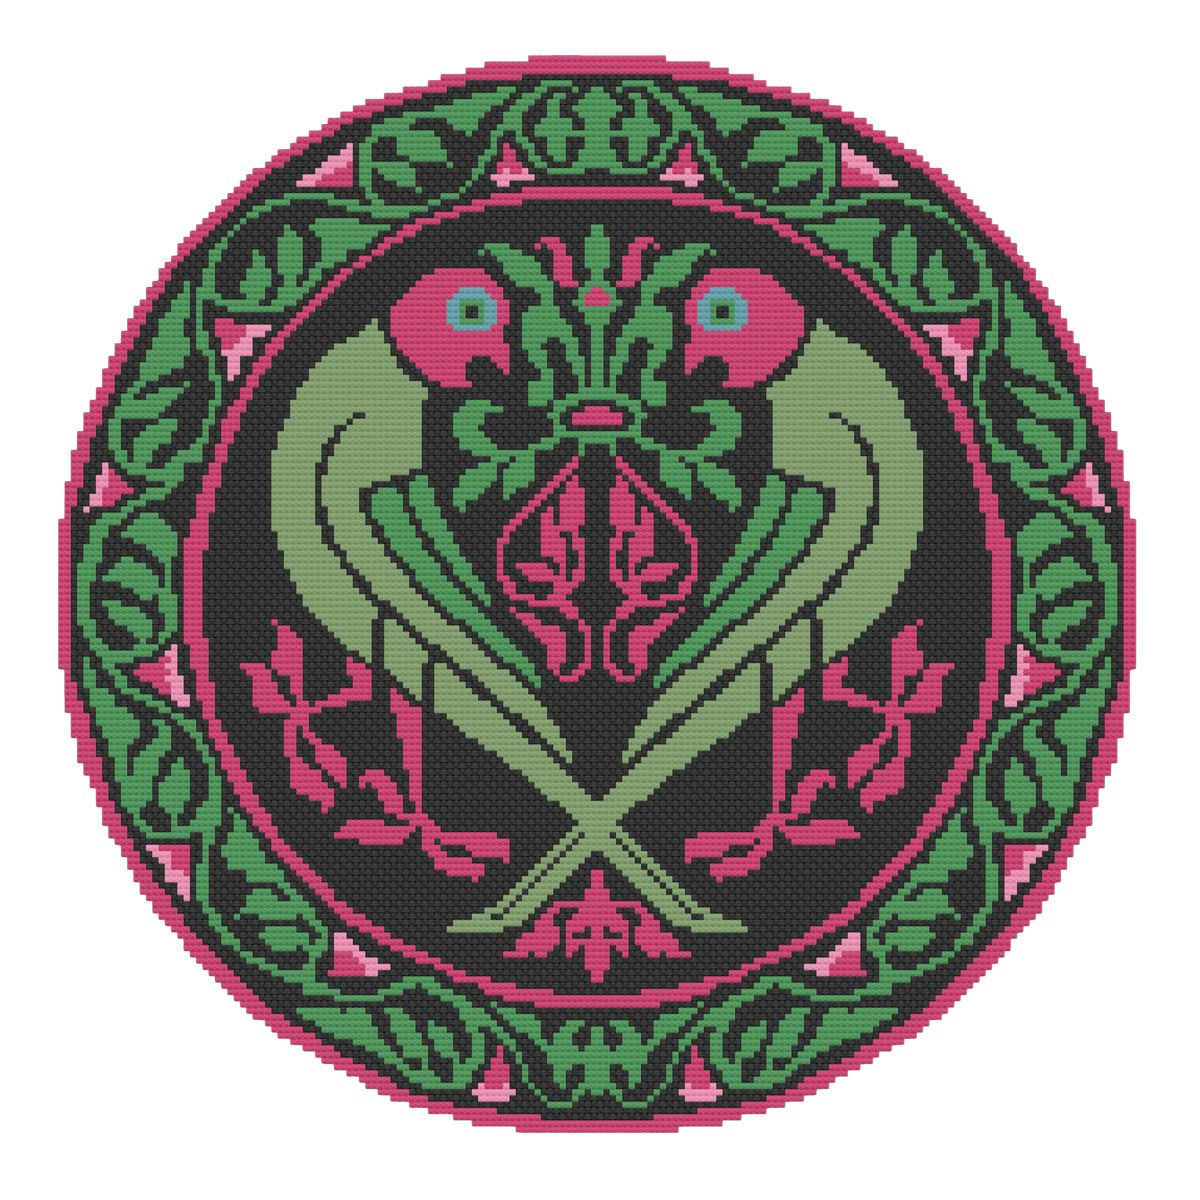 Historiana Cross Stitch Parrots Roundel Pattern